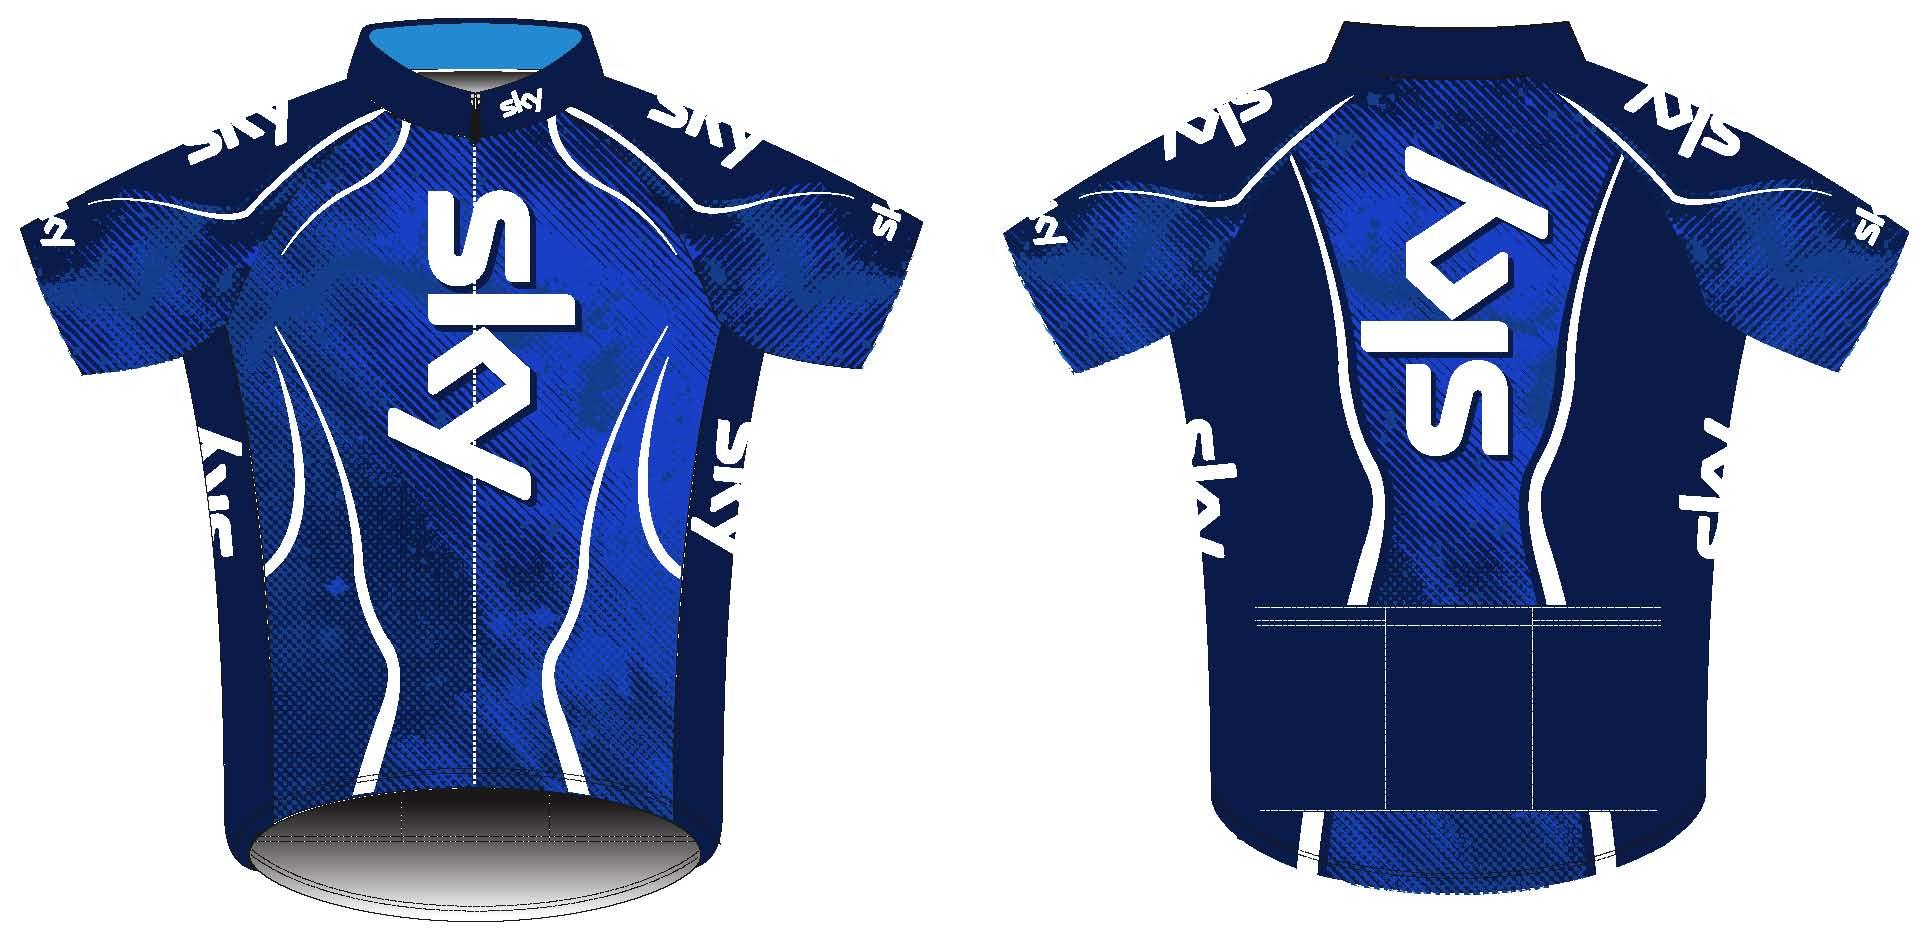 Durbin Sky jersey